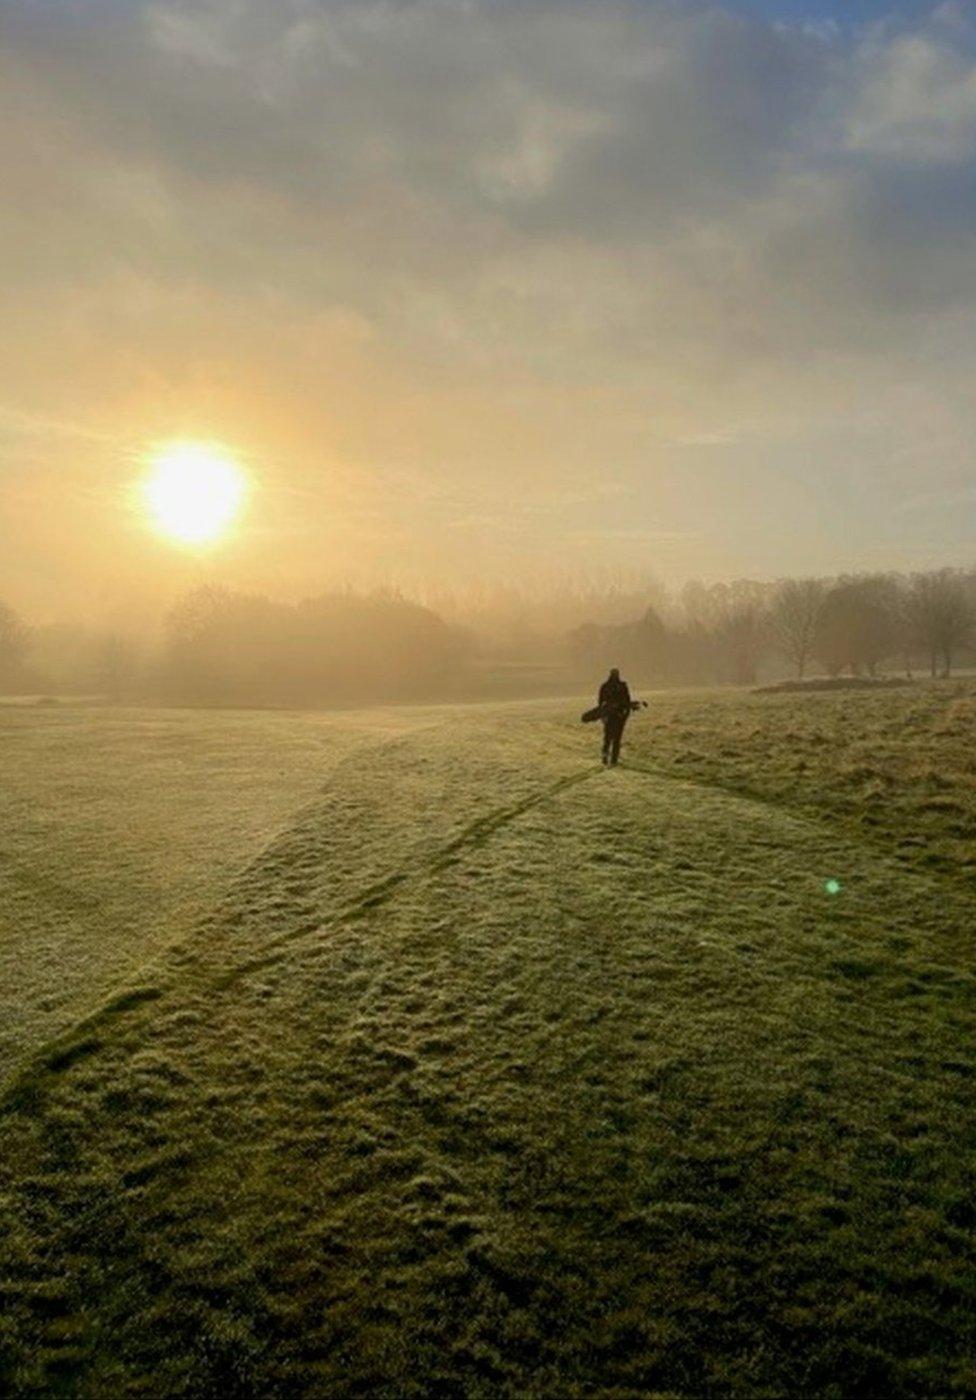 Fog at Rouken Glen golf course